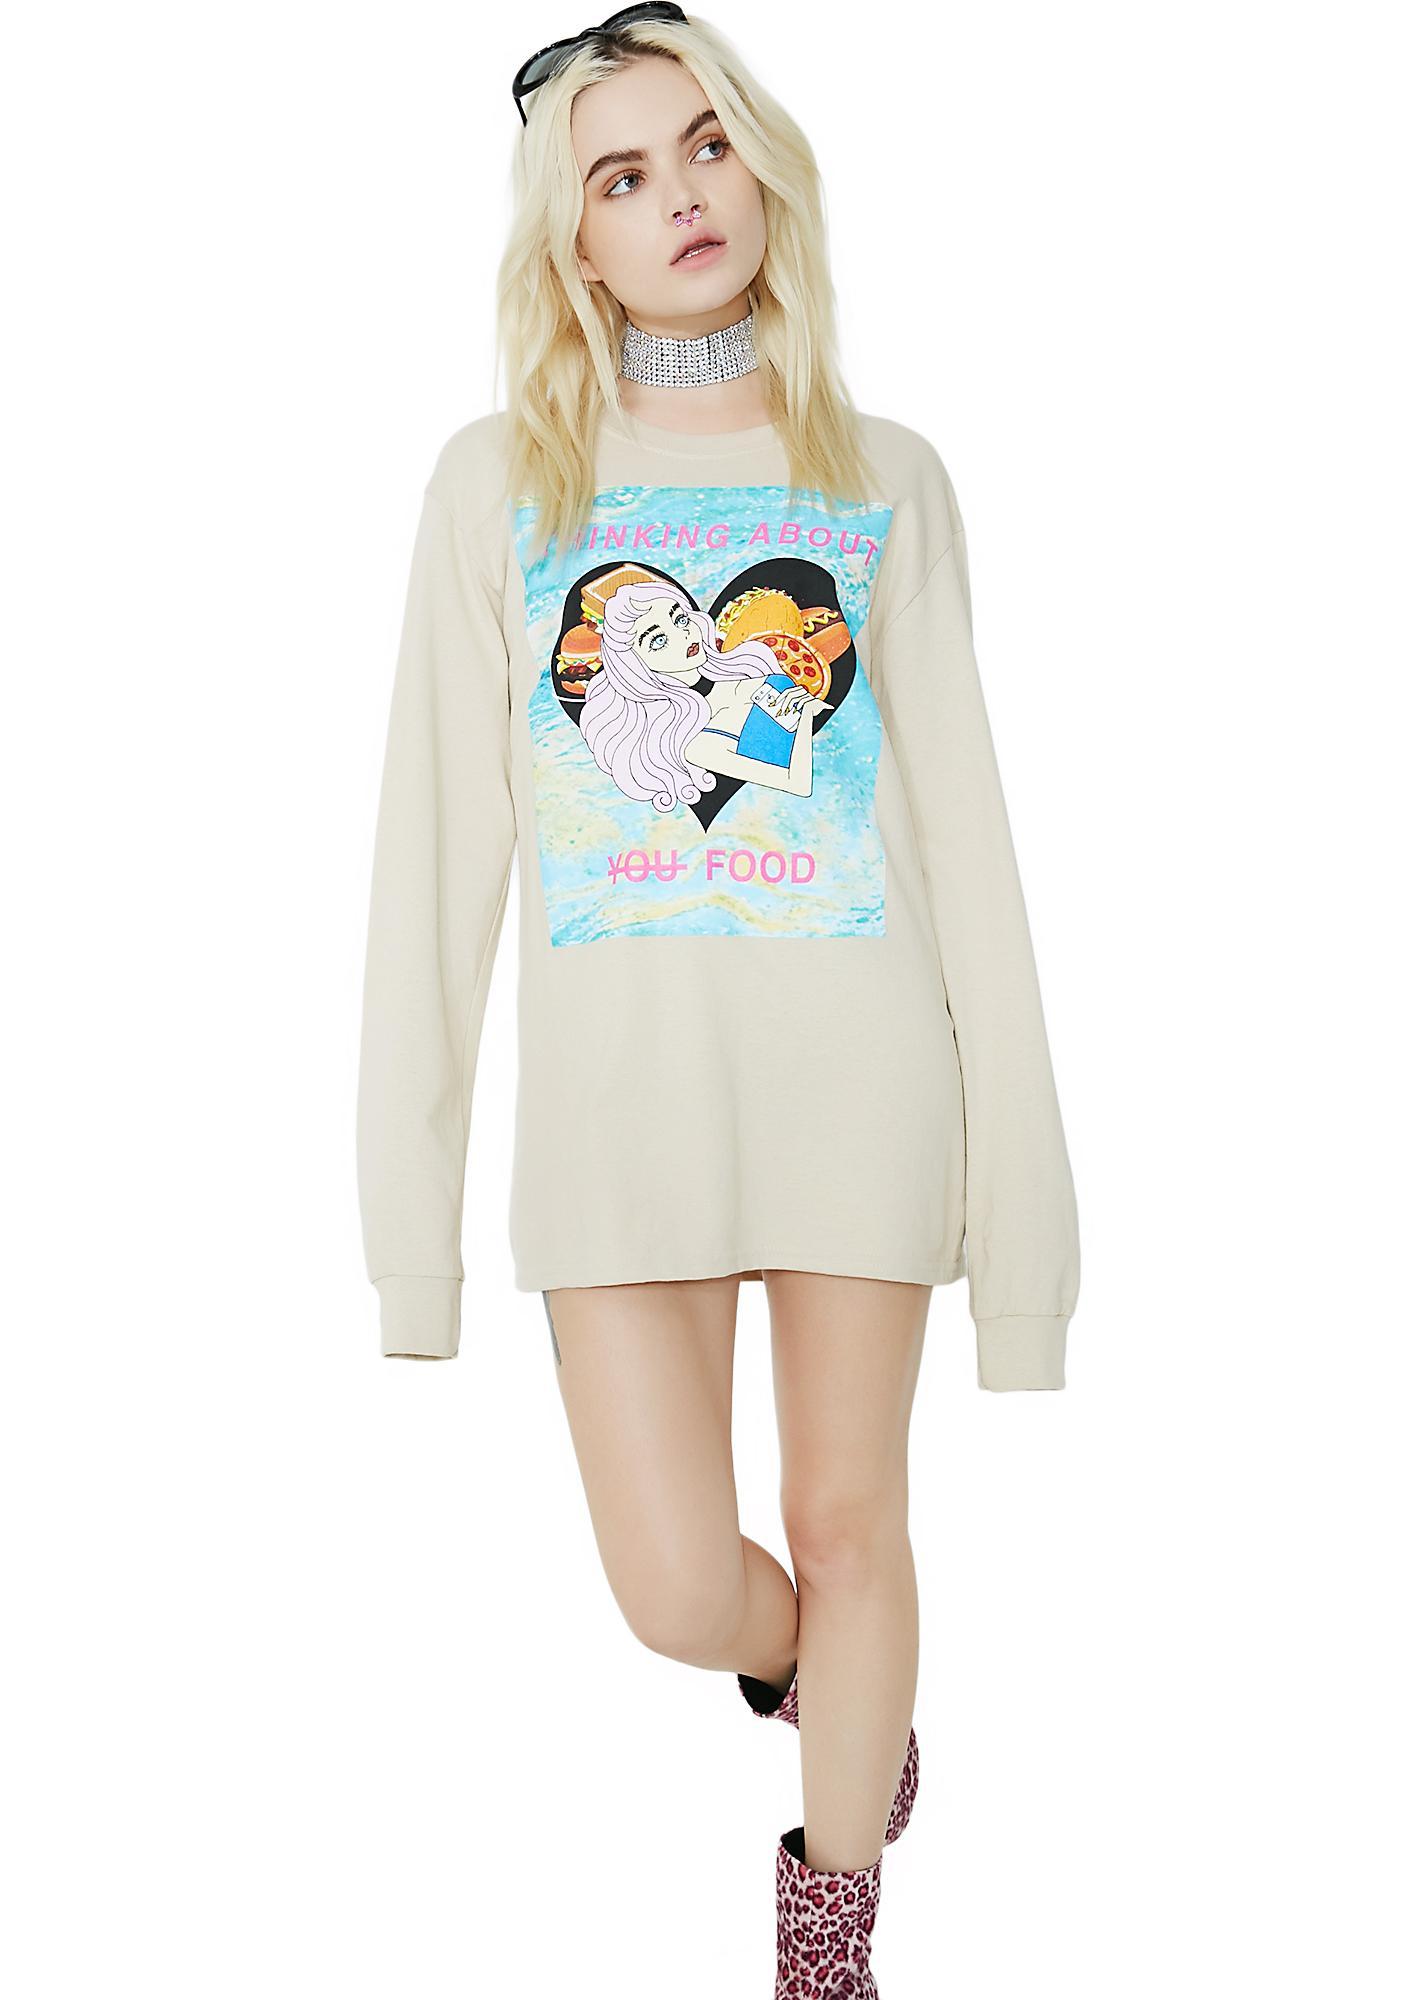 Peachbrain Thinking About You Long Sleeve Shirt